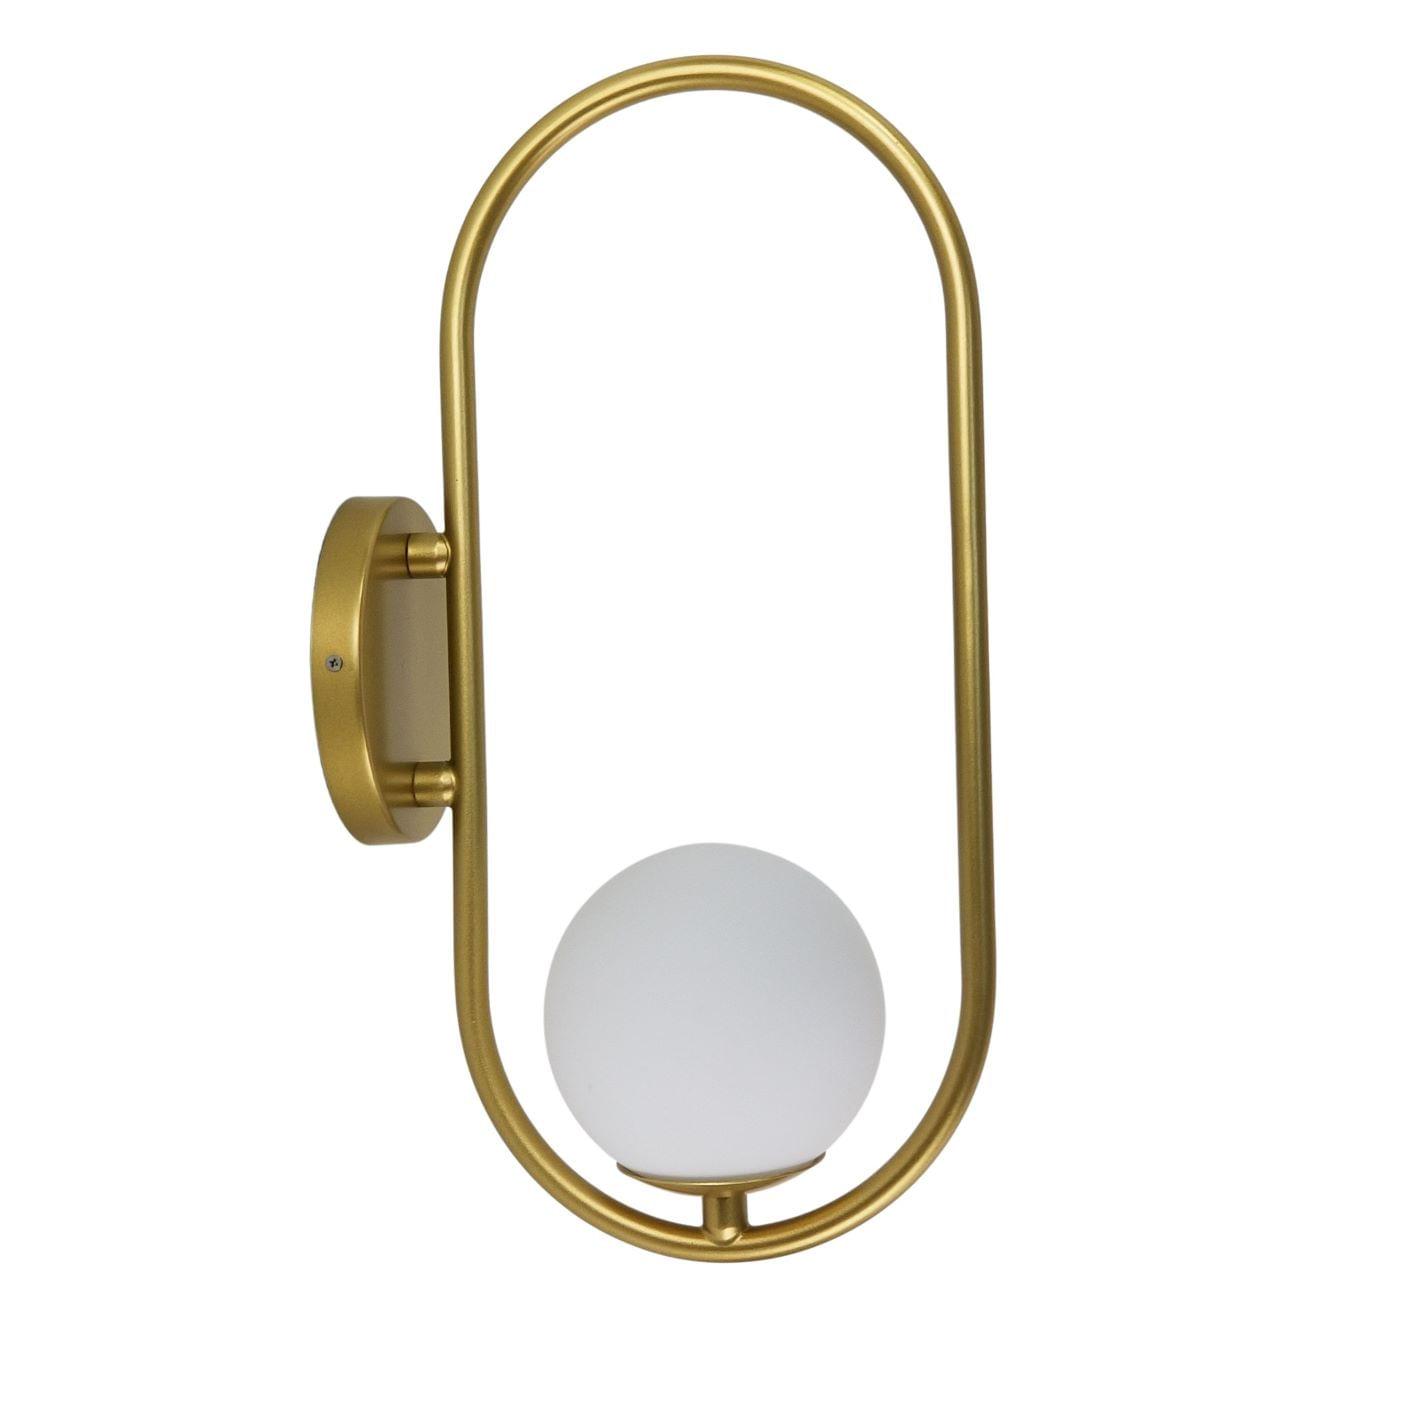 Arandela Moderna Aro Oval Dourado Com Globo Branco 12cm